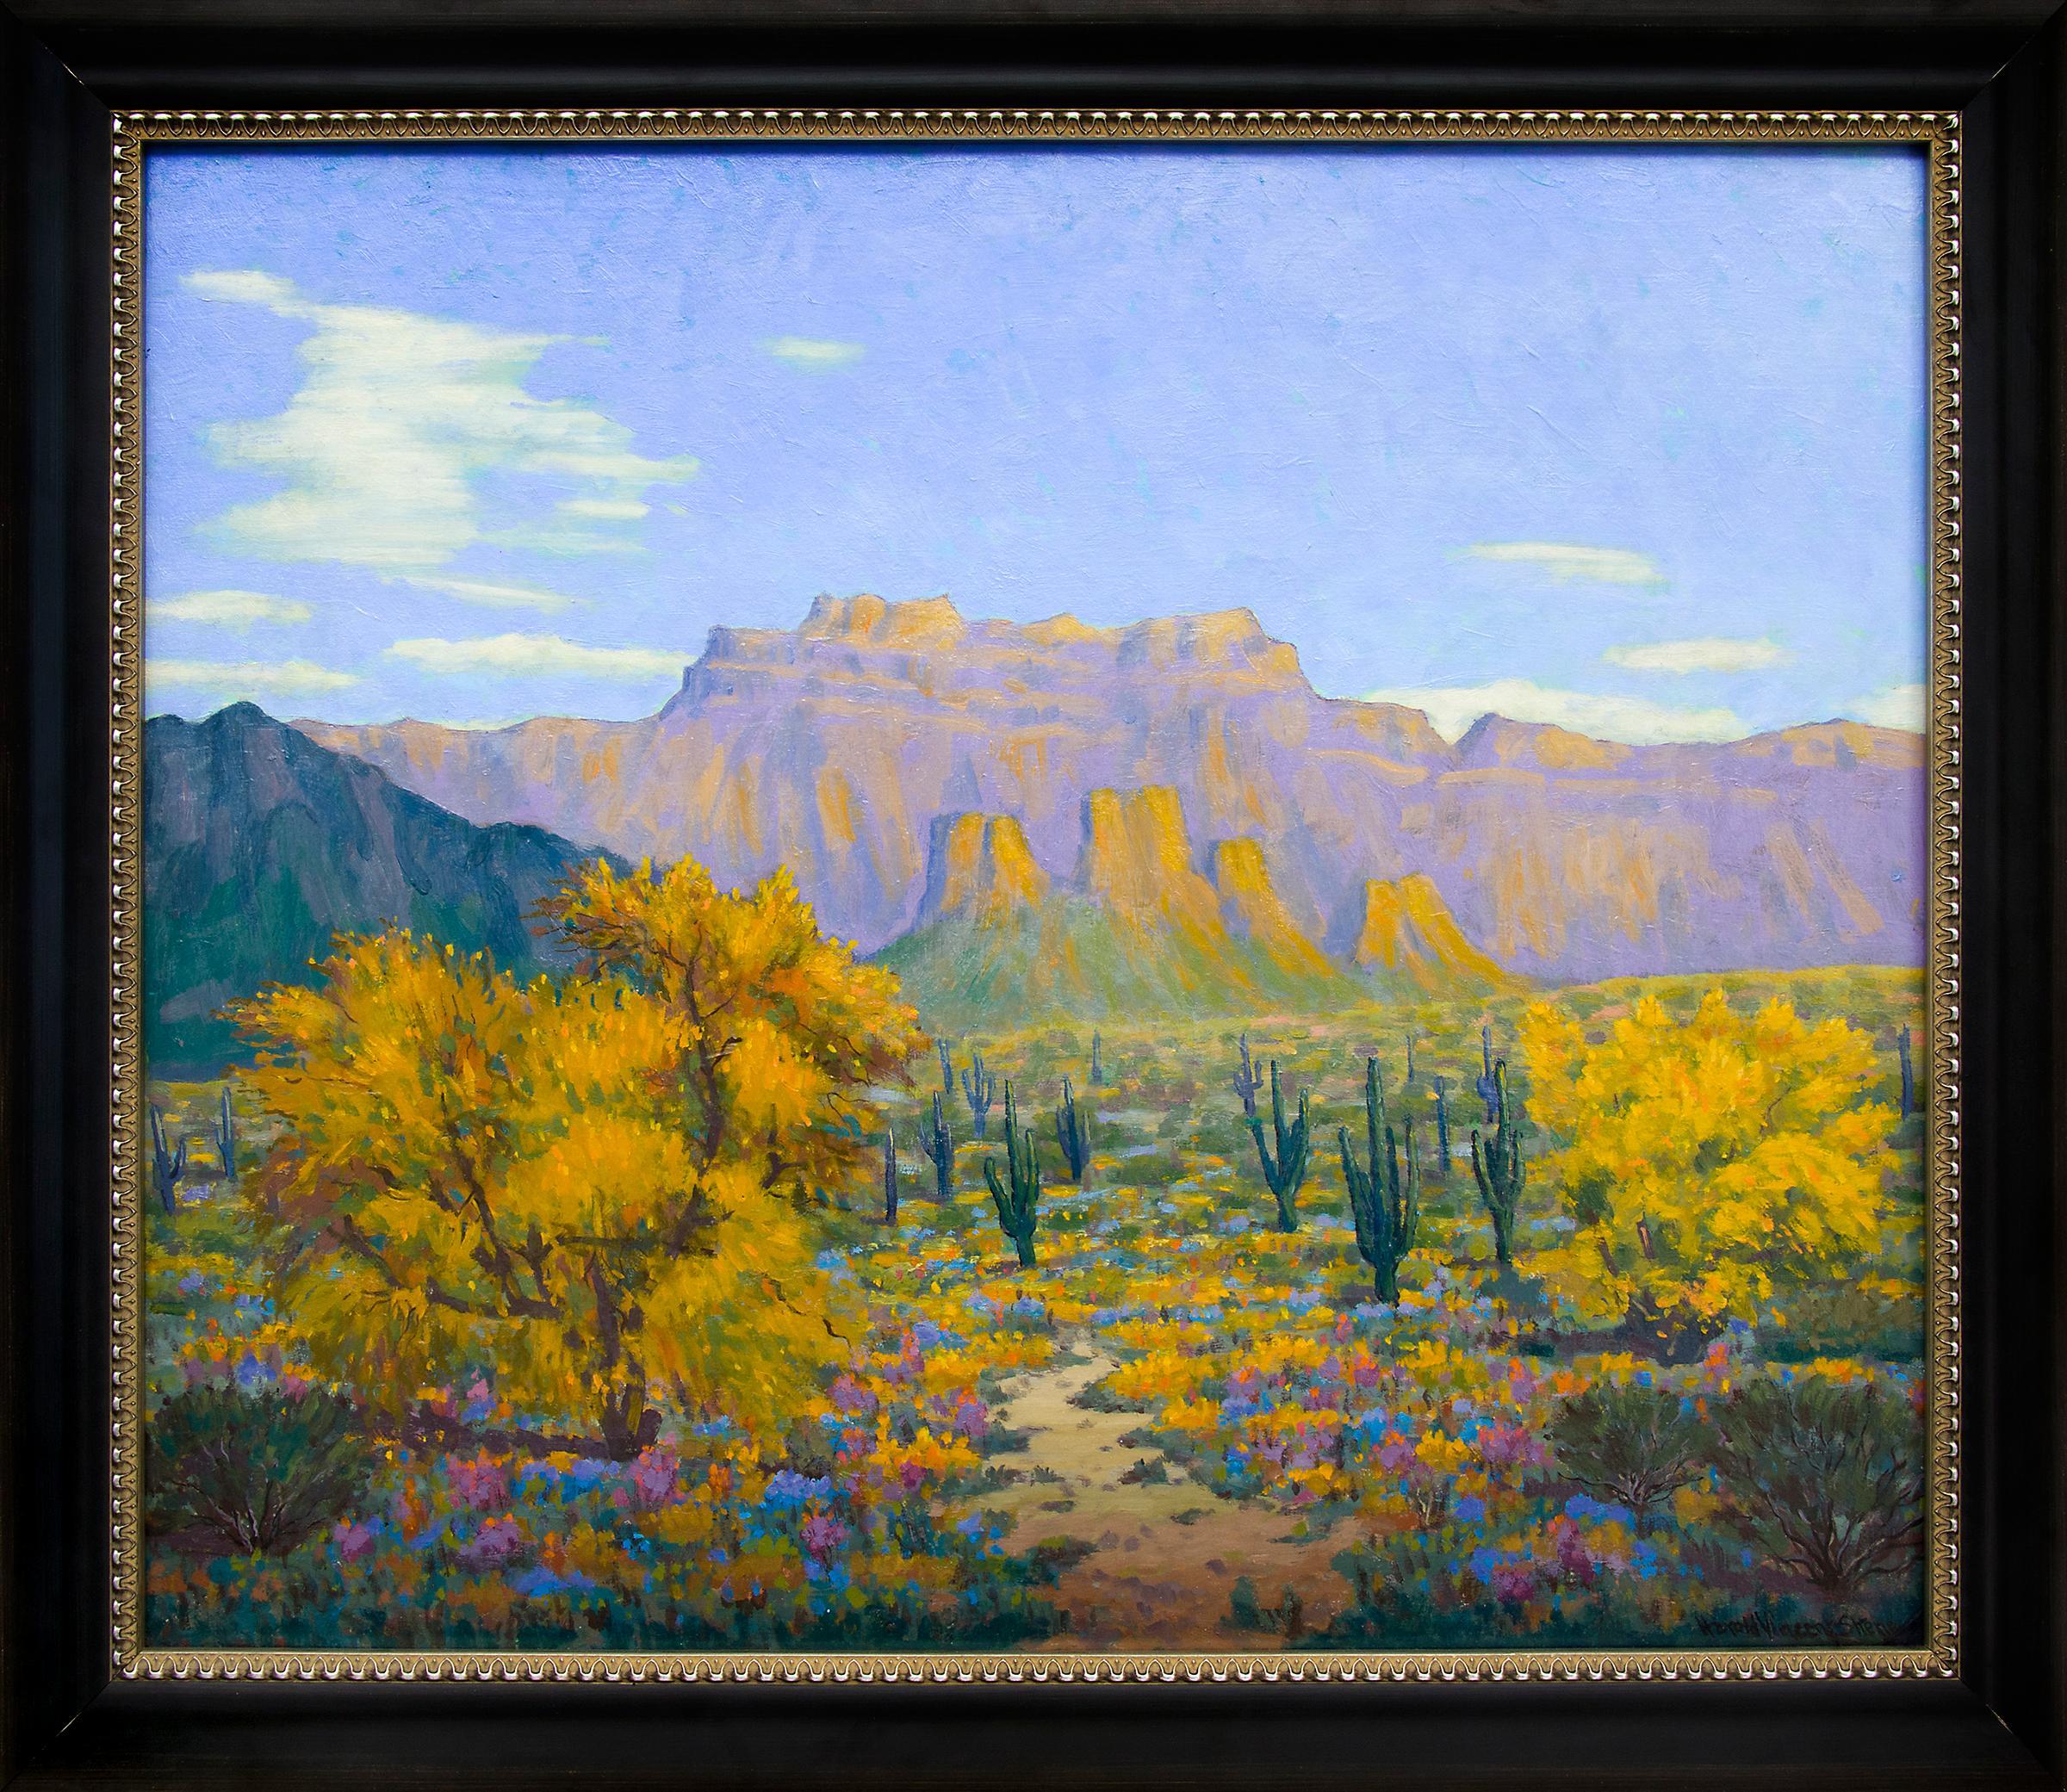 Desert Gold (Southwestern Landscape with Saguaro Cactus & Mountains in Autumn)